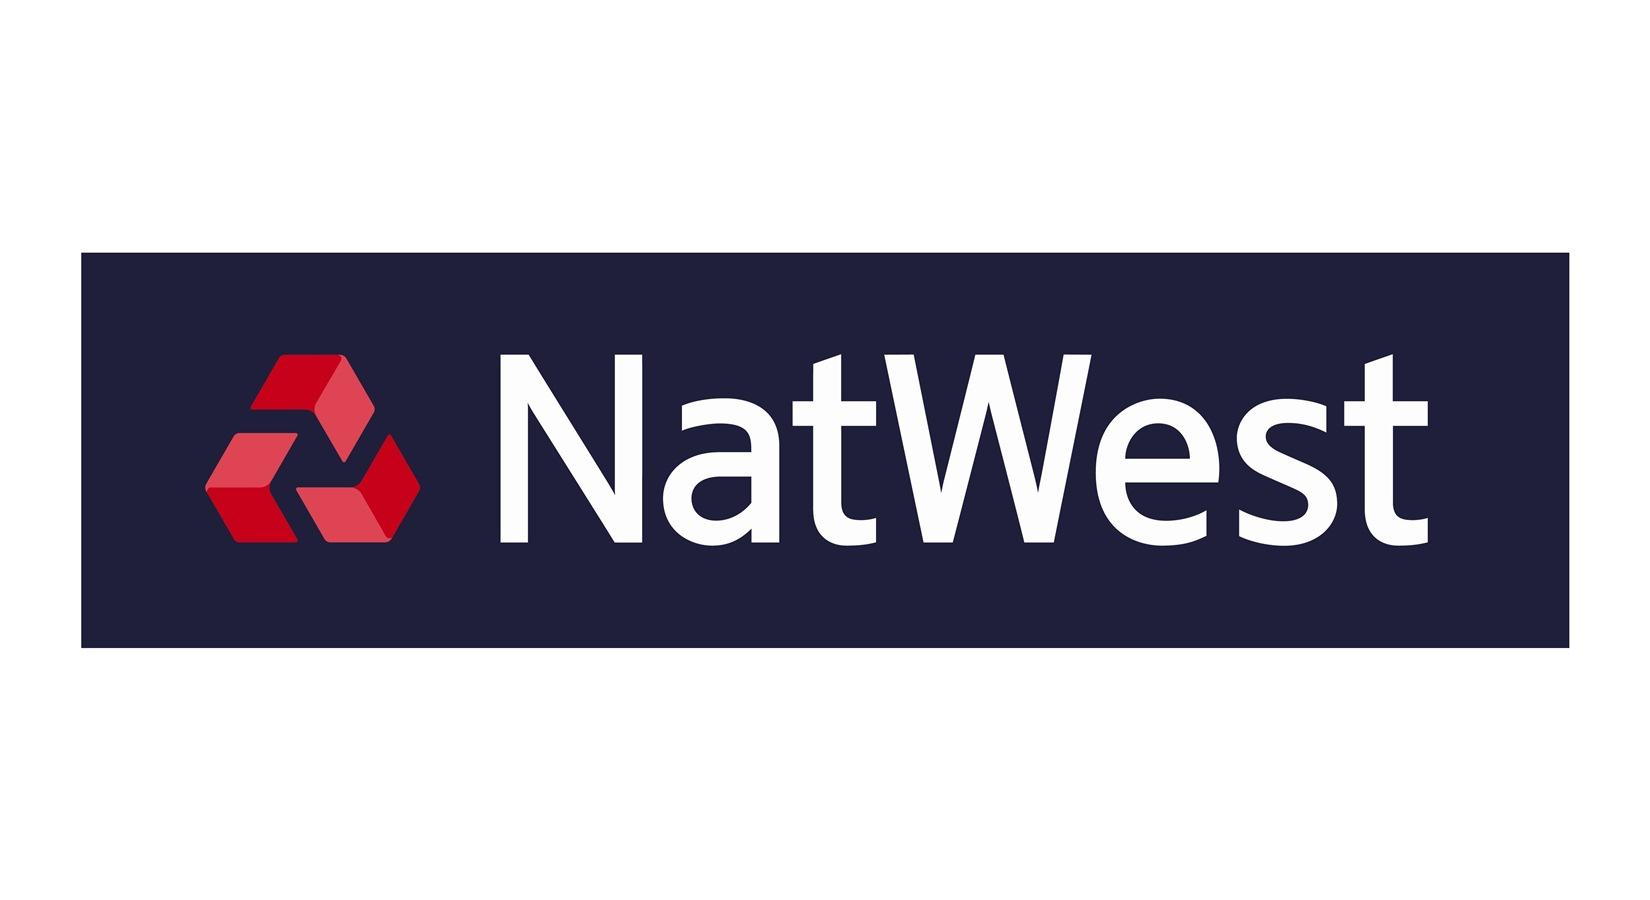 natwest-logo-canvas2